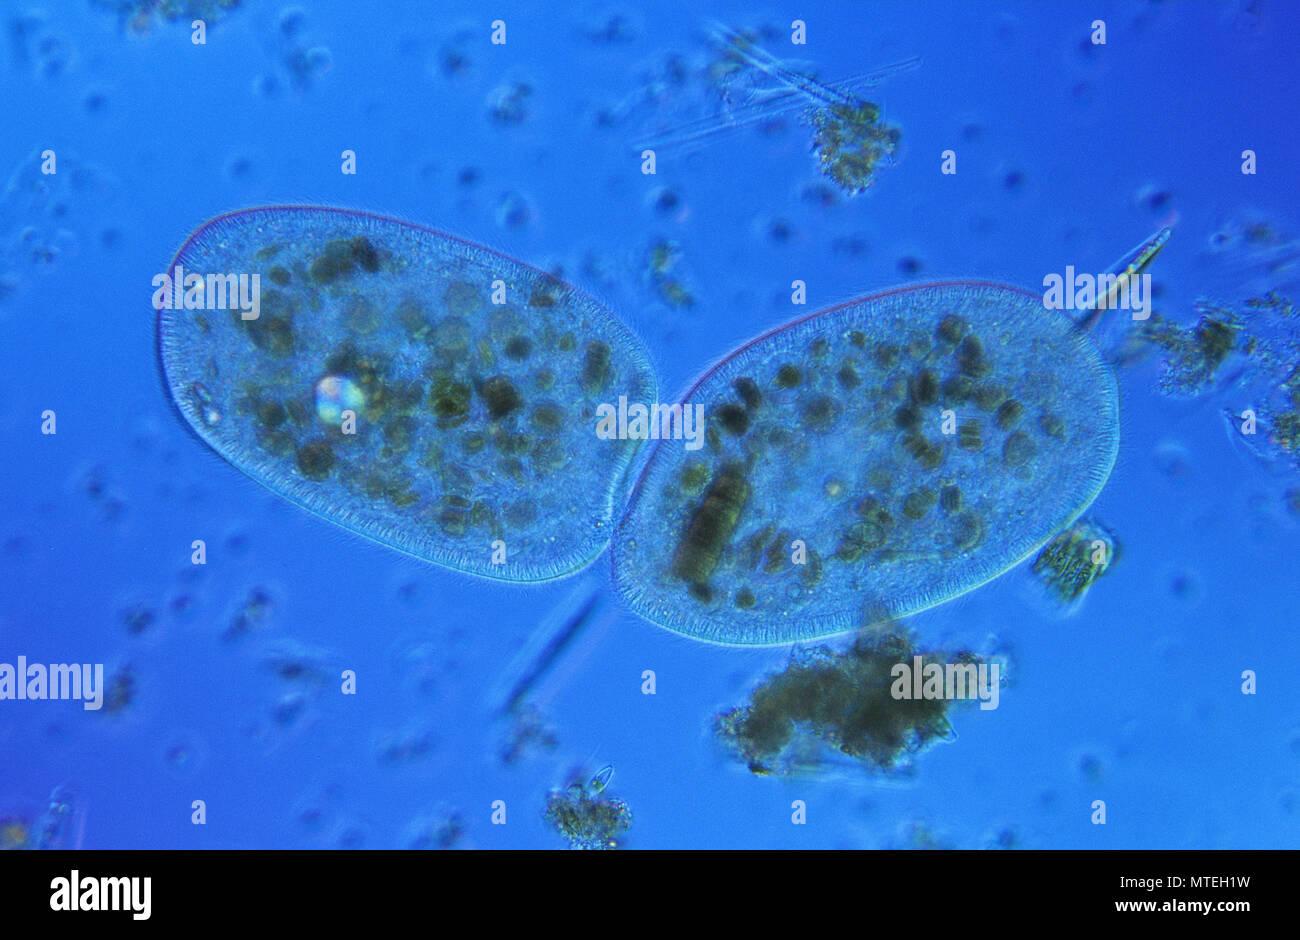 Bipartition.La división celular.Ciliata.protozoo.microscopia óptica Foto de stock